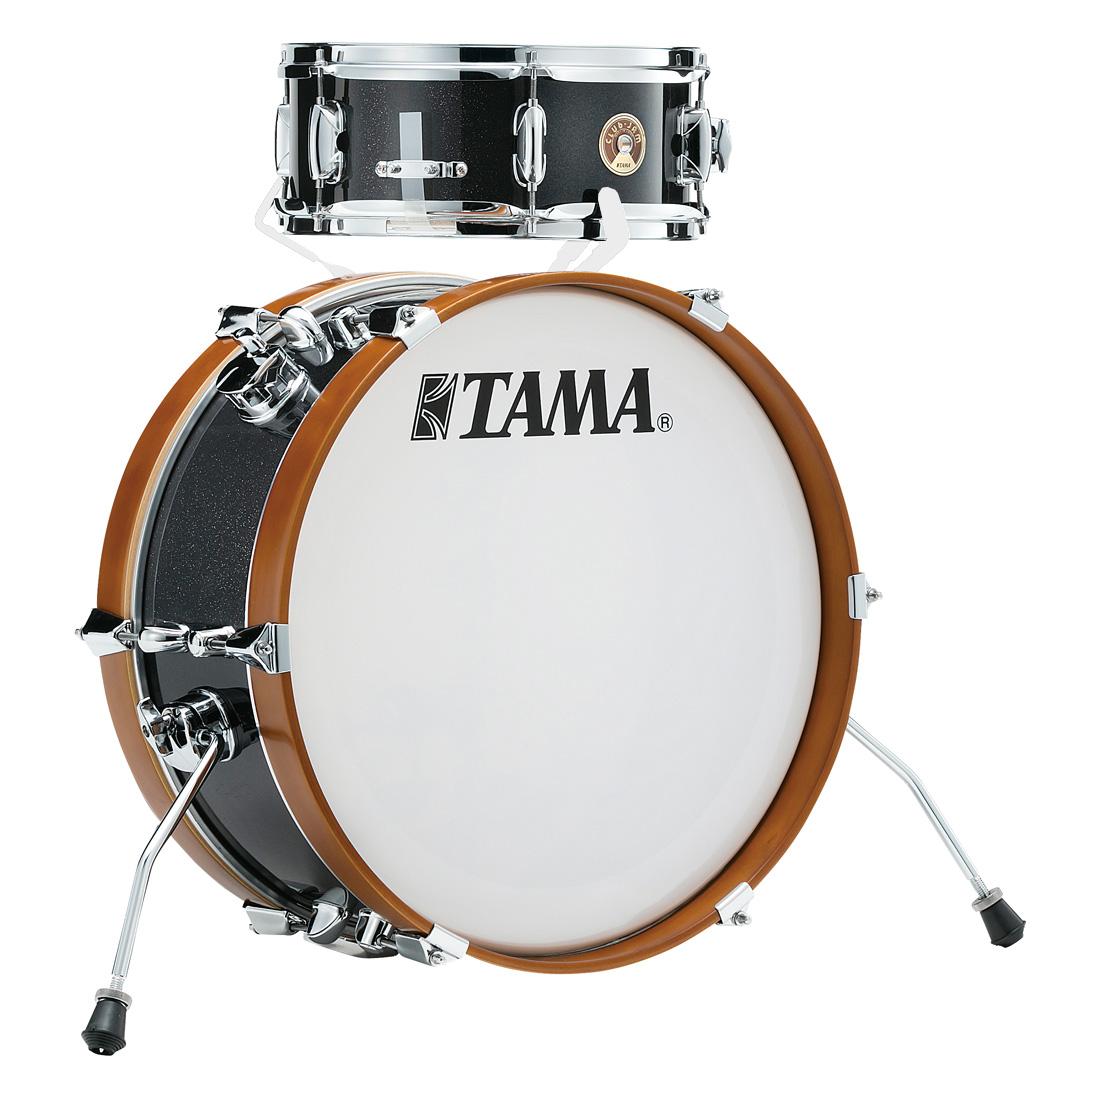 TAMA / LJK28S-CCM タマ Club-JAM Mini【お取り寄せ商品】